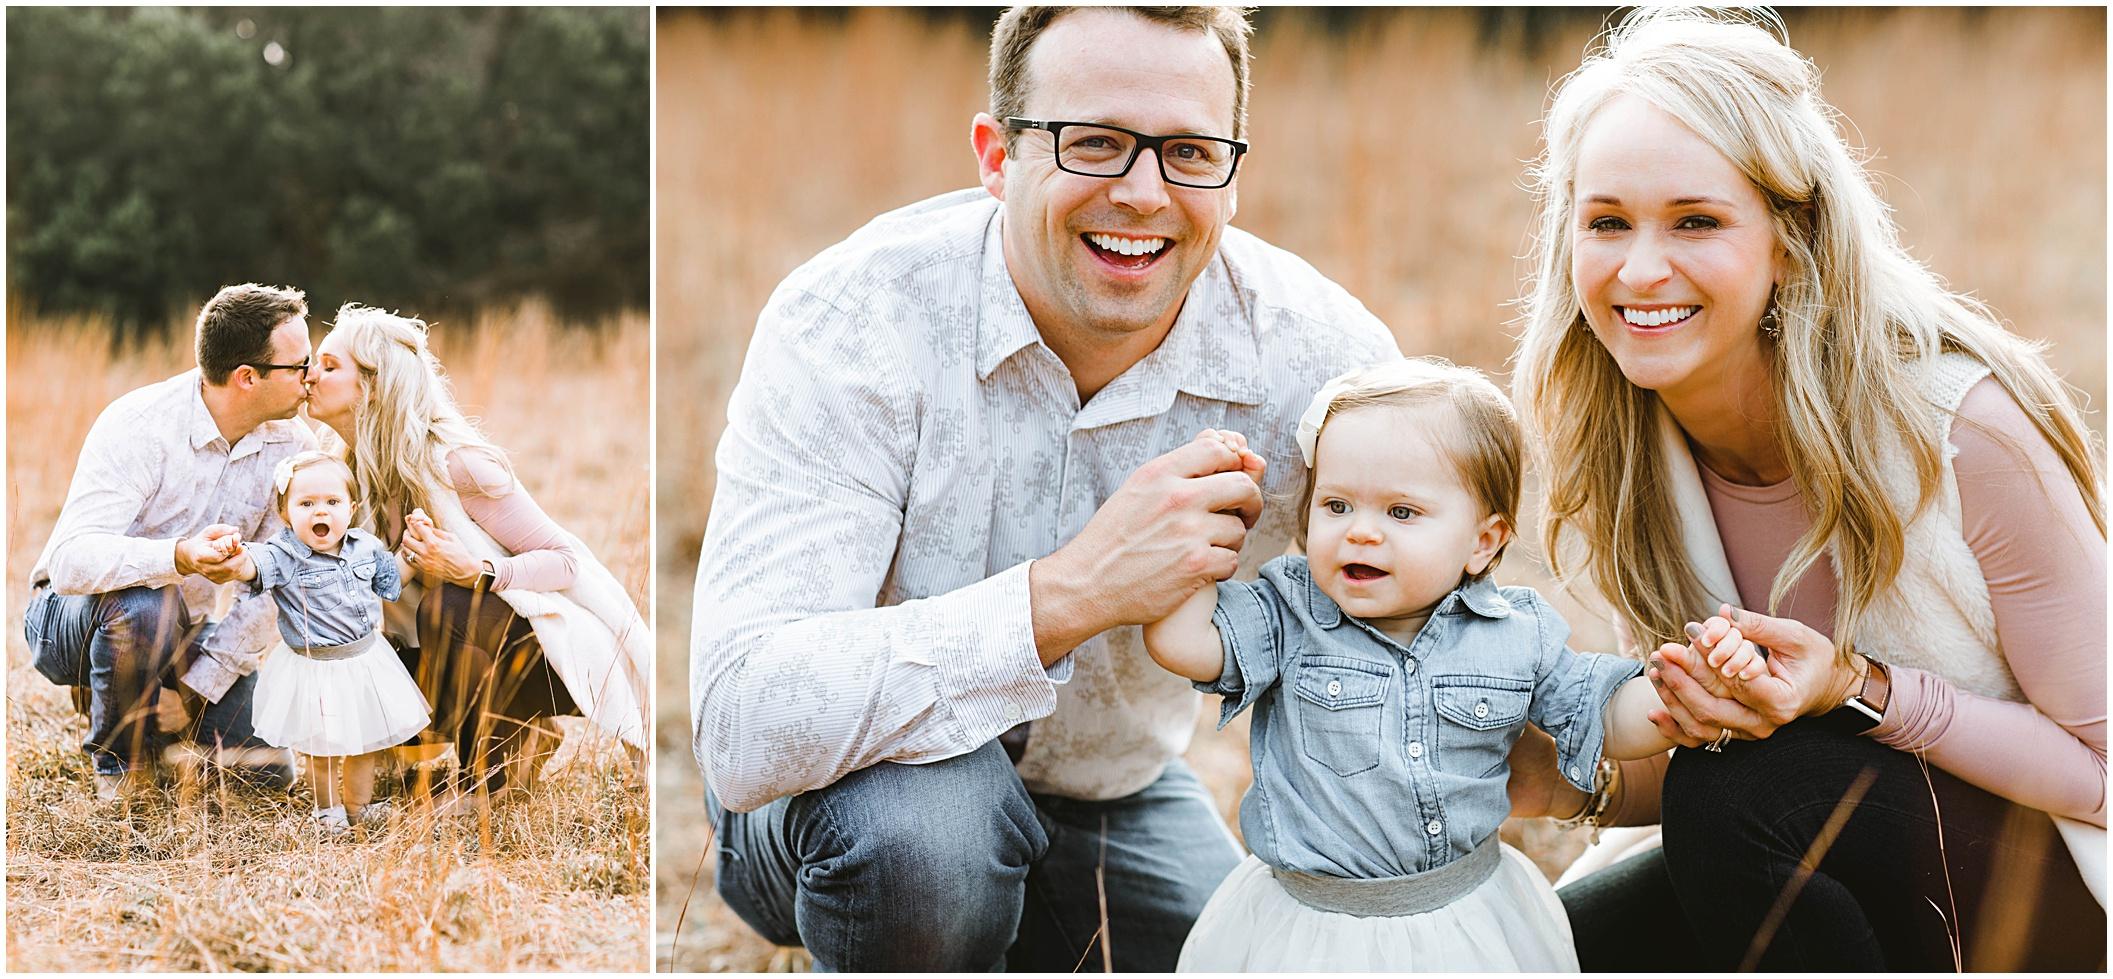 Austin Family Portrait Photography_0204.jpg